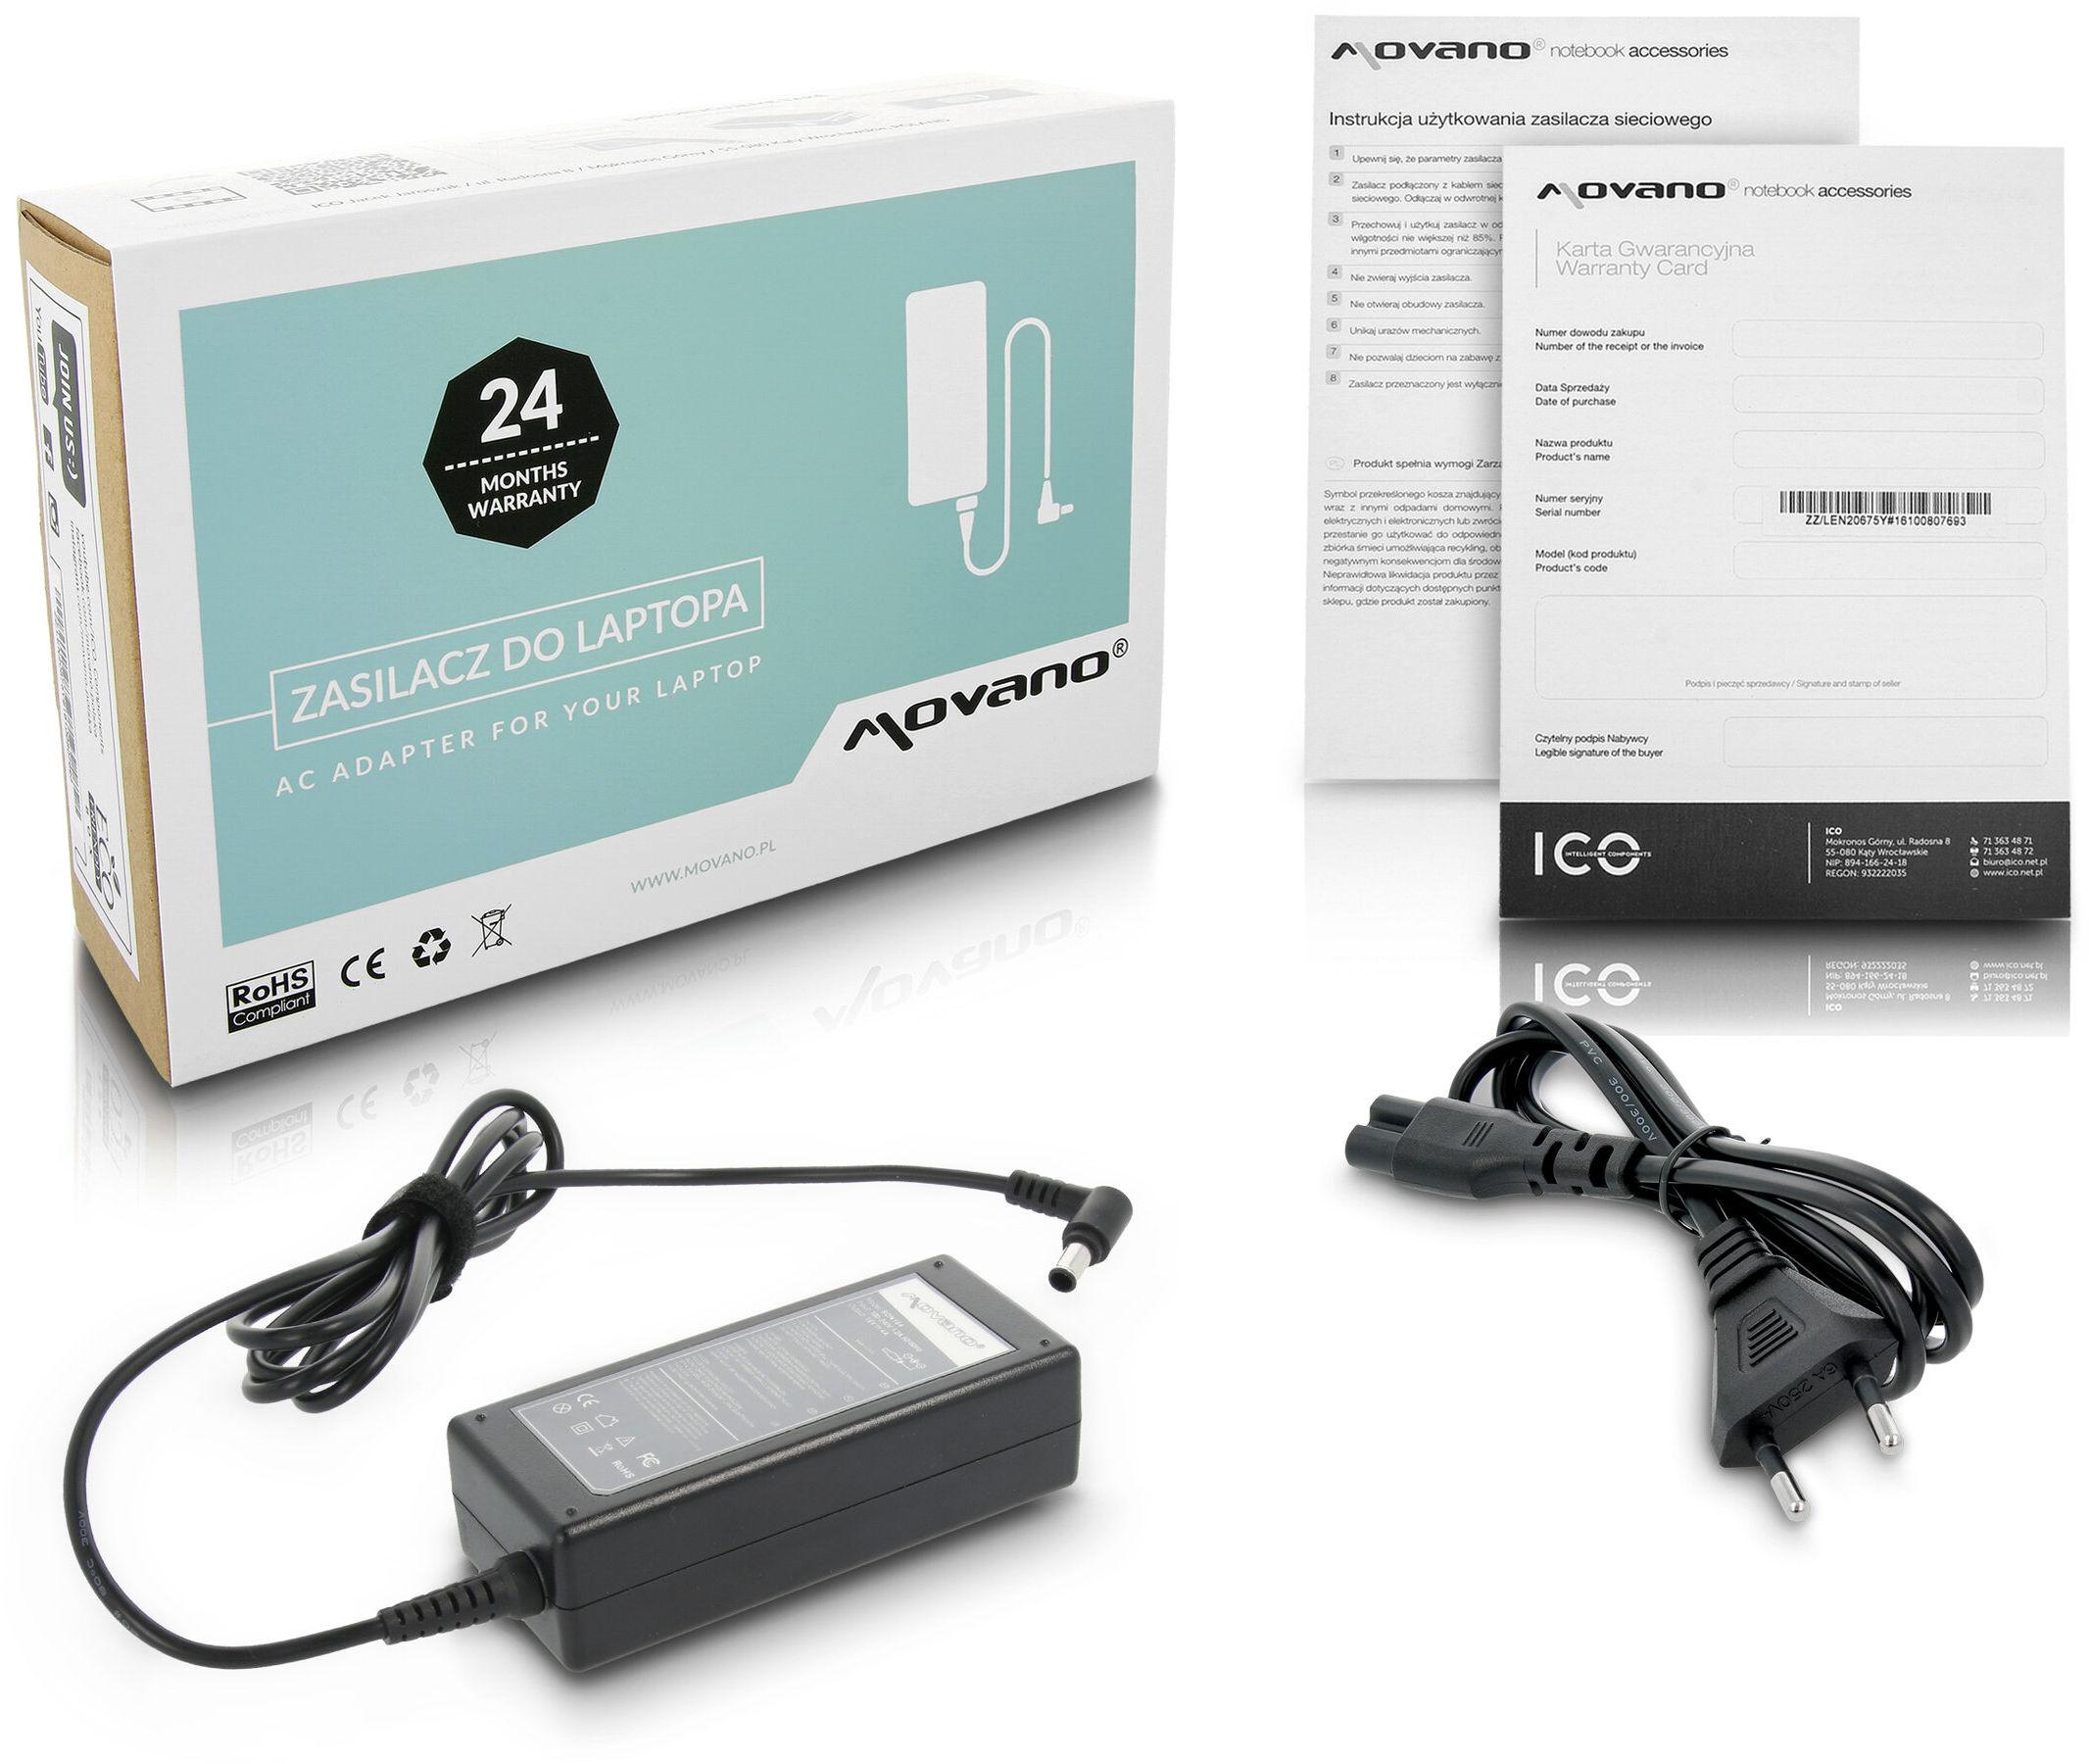 Zasilacz ładowarka do Sony Vaio PCG-GR370 PCG-GR300K PCG-GR300